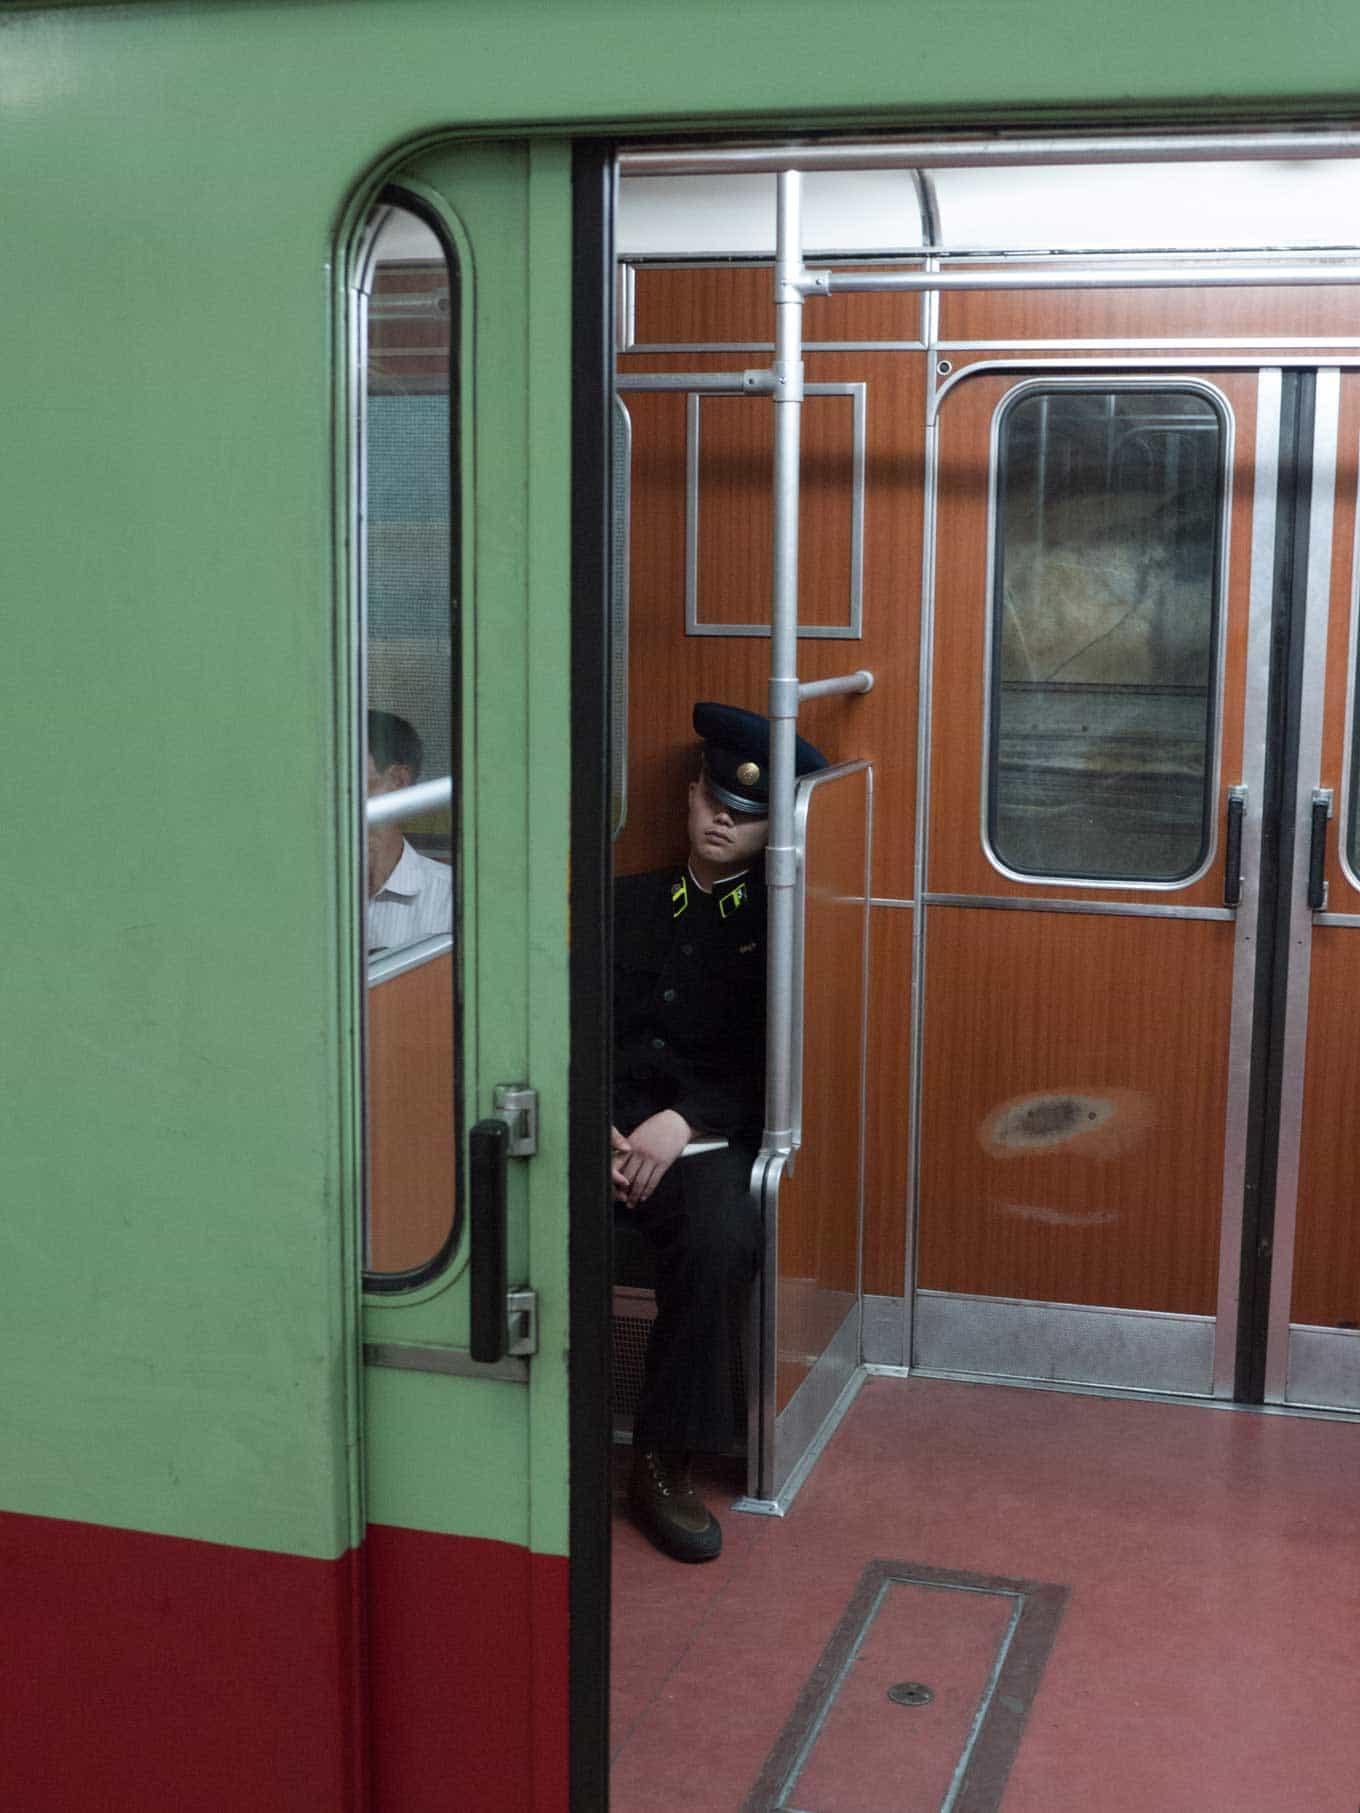 North Korean sleeps in their uniform on the public transit subway system in North Korea Pyongyang